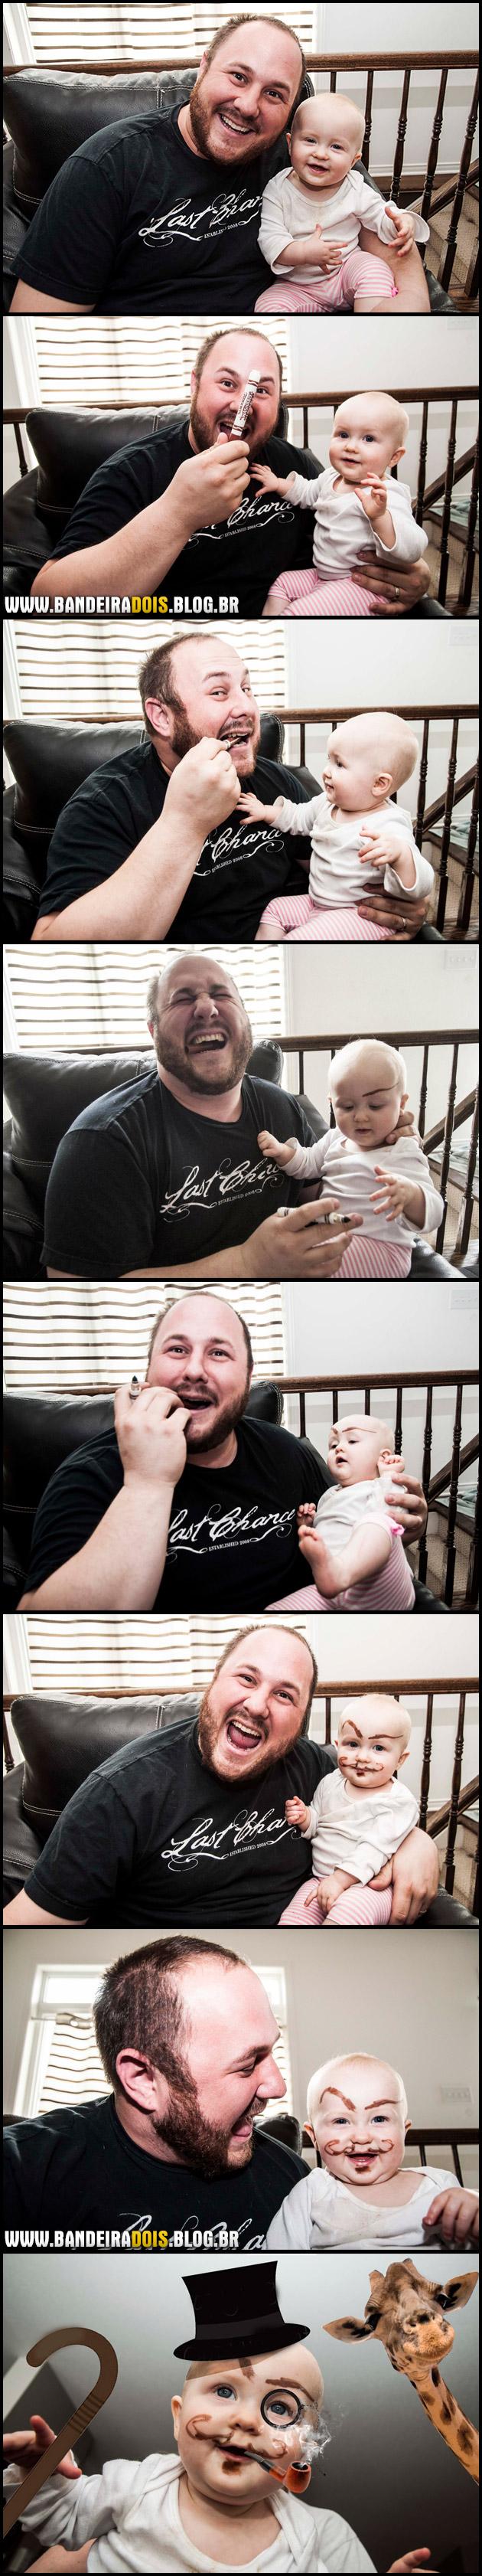 Pai cuidando do bebê #2